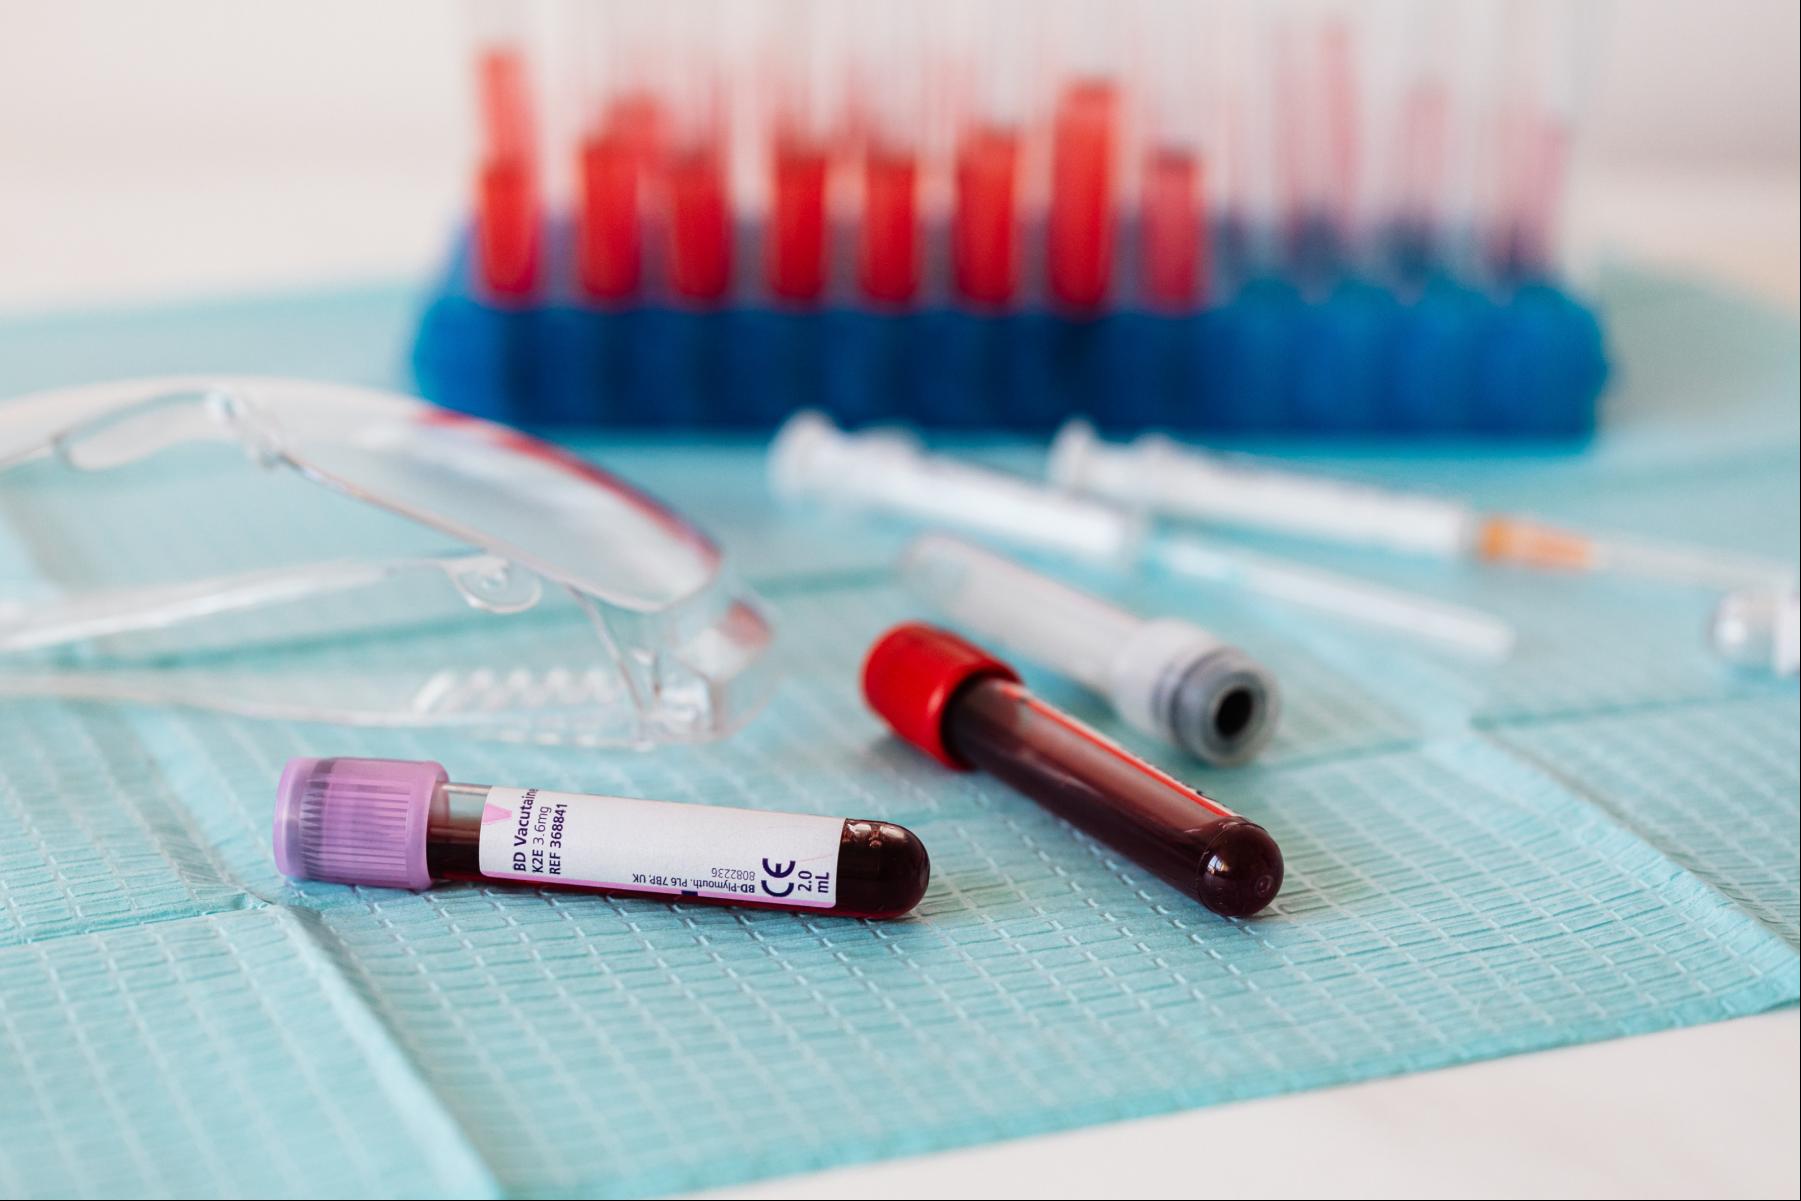 Should I get a Covid-19 antibody test?